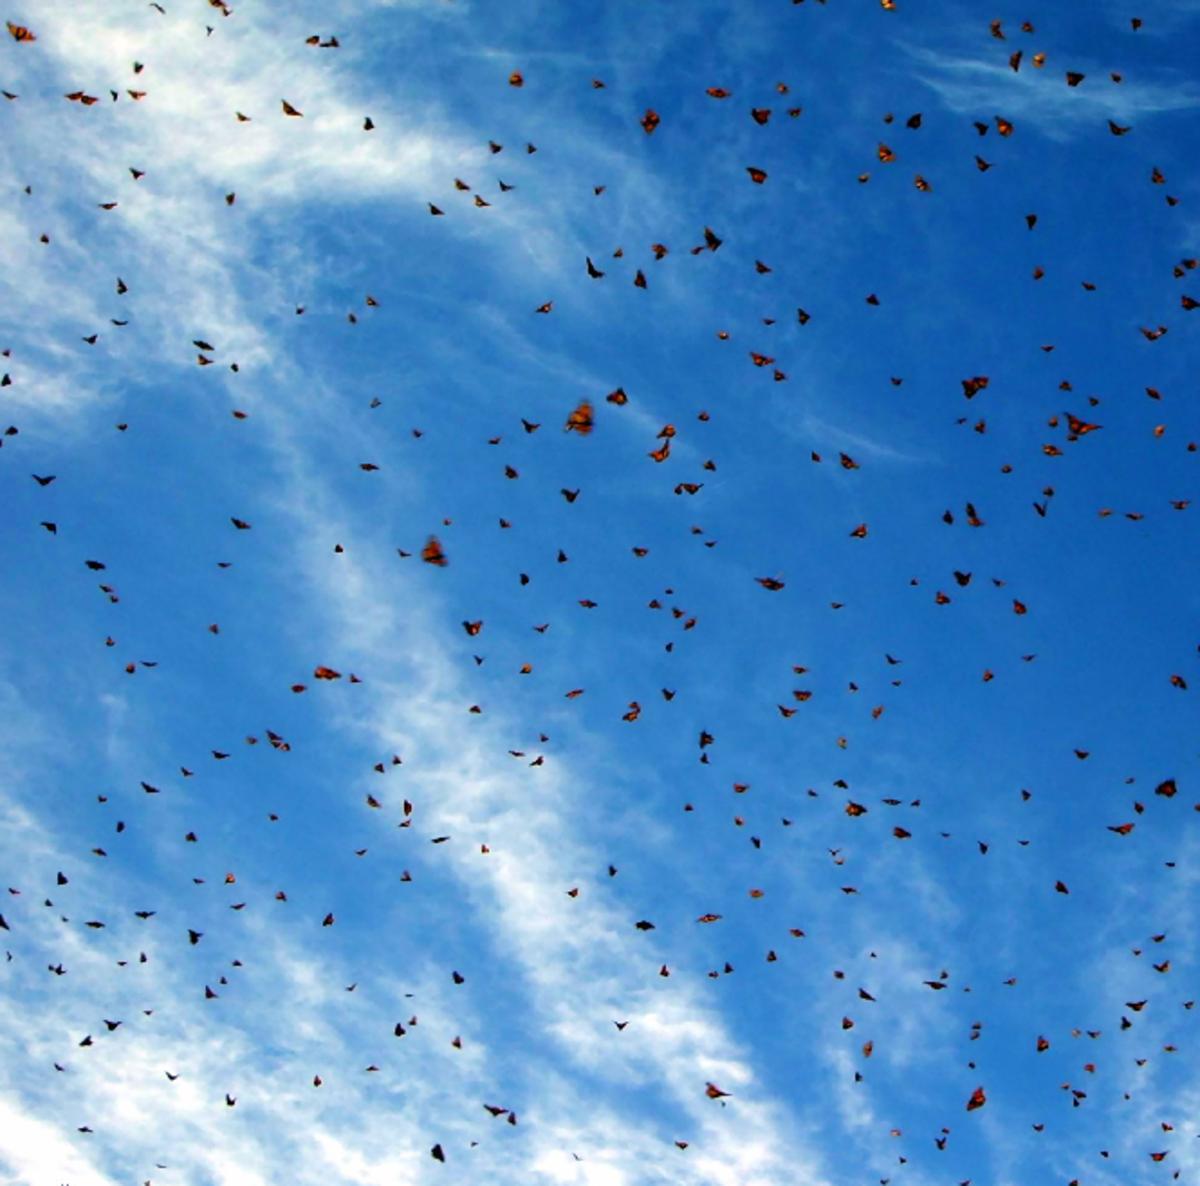 Swarm of Migrating Monarch Butterflies